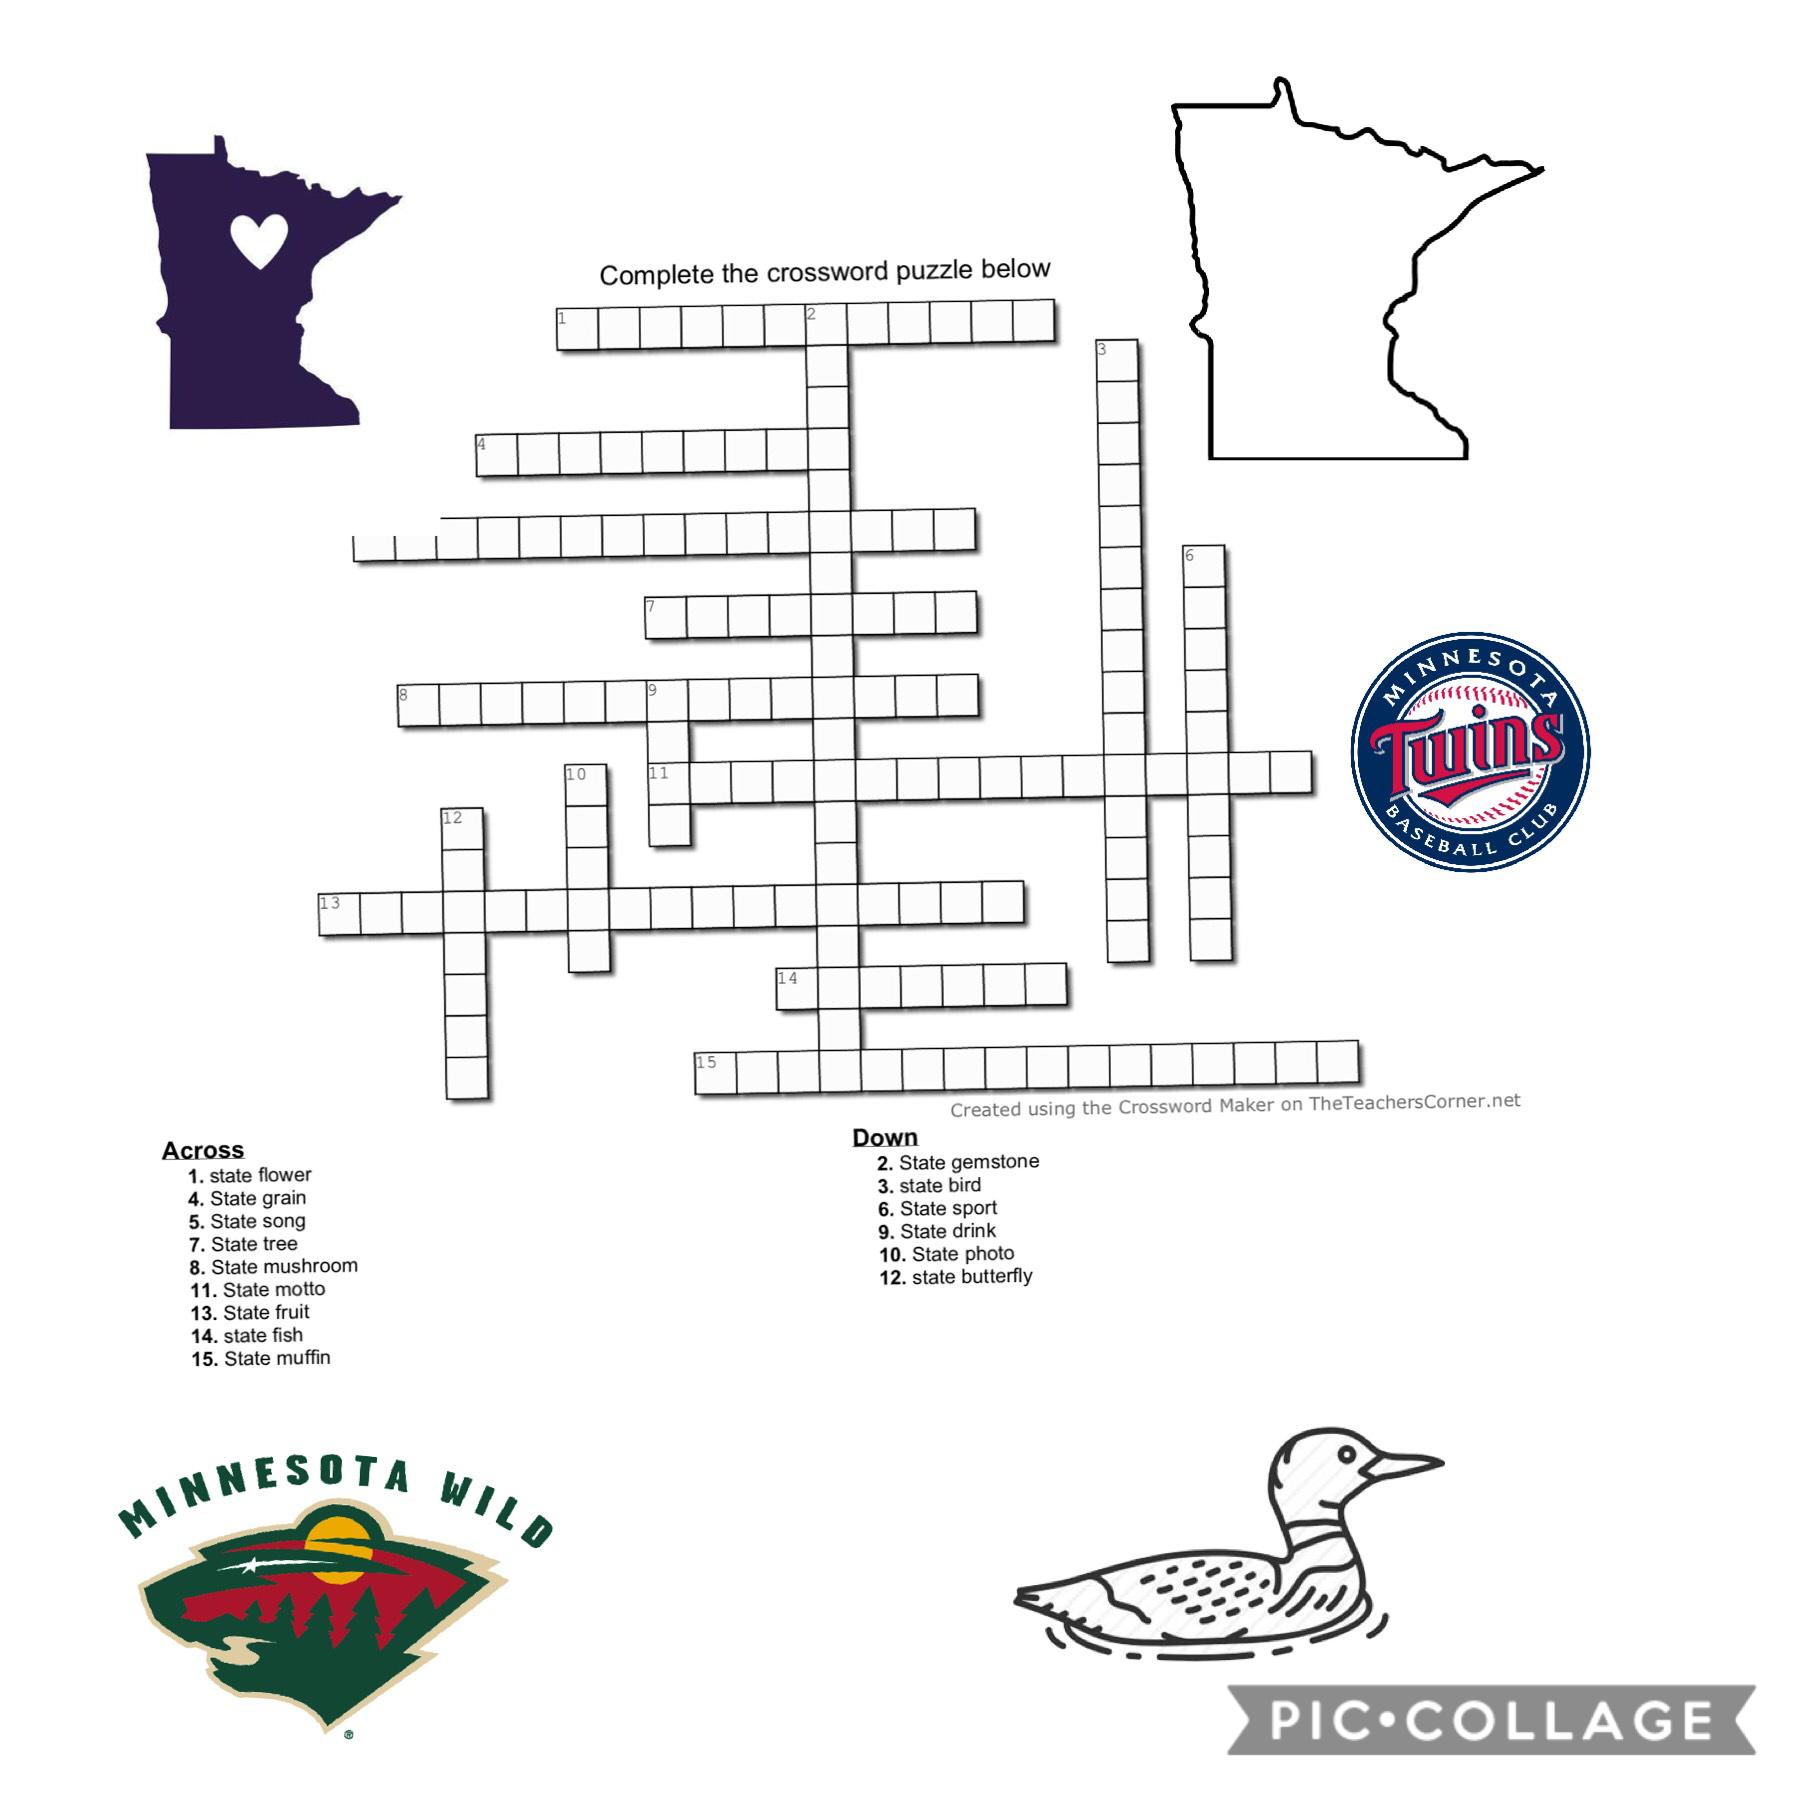 Stuff for Minnesota history in school 😂